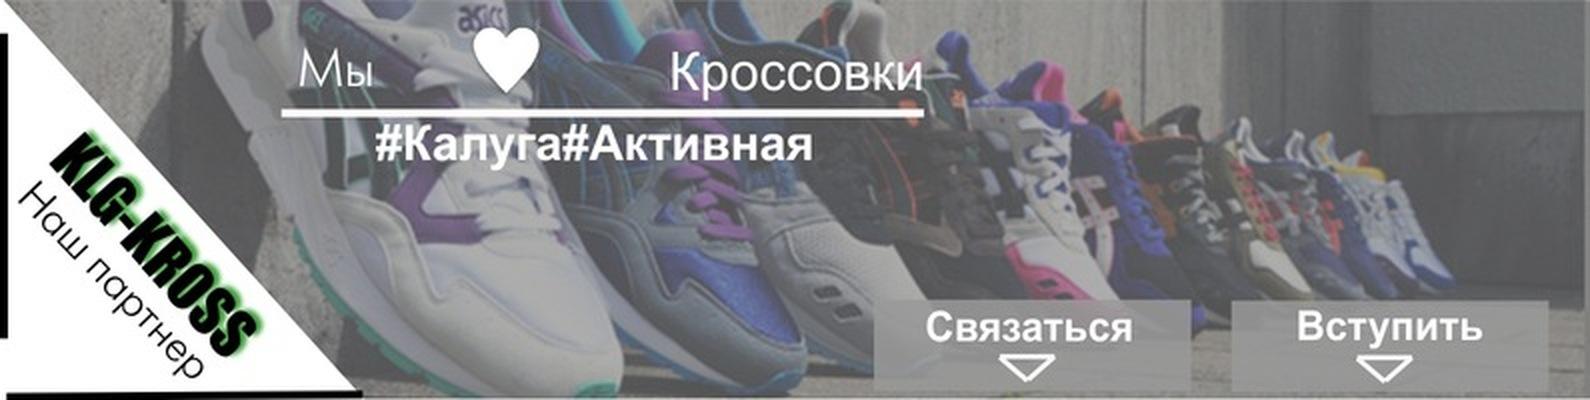 ebf87924 Кроссовки и спорт Калуга | ВКонтакте